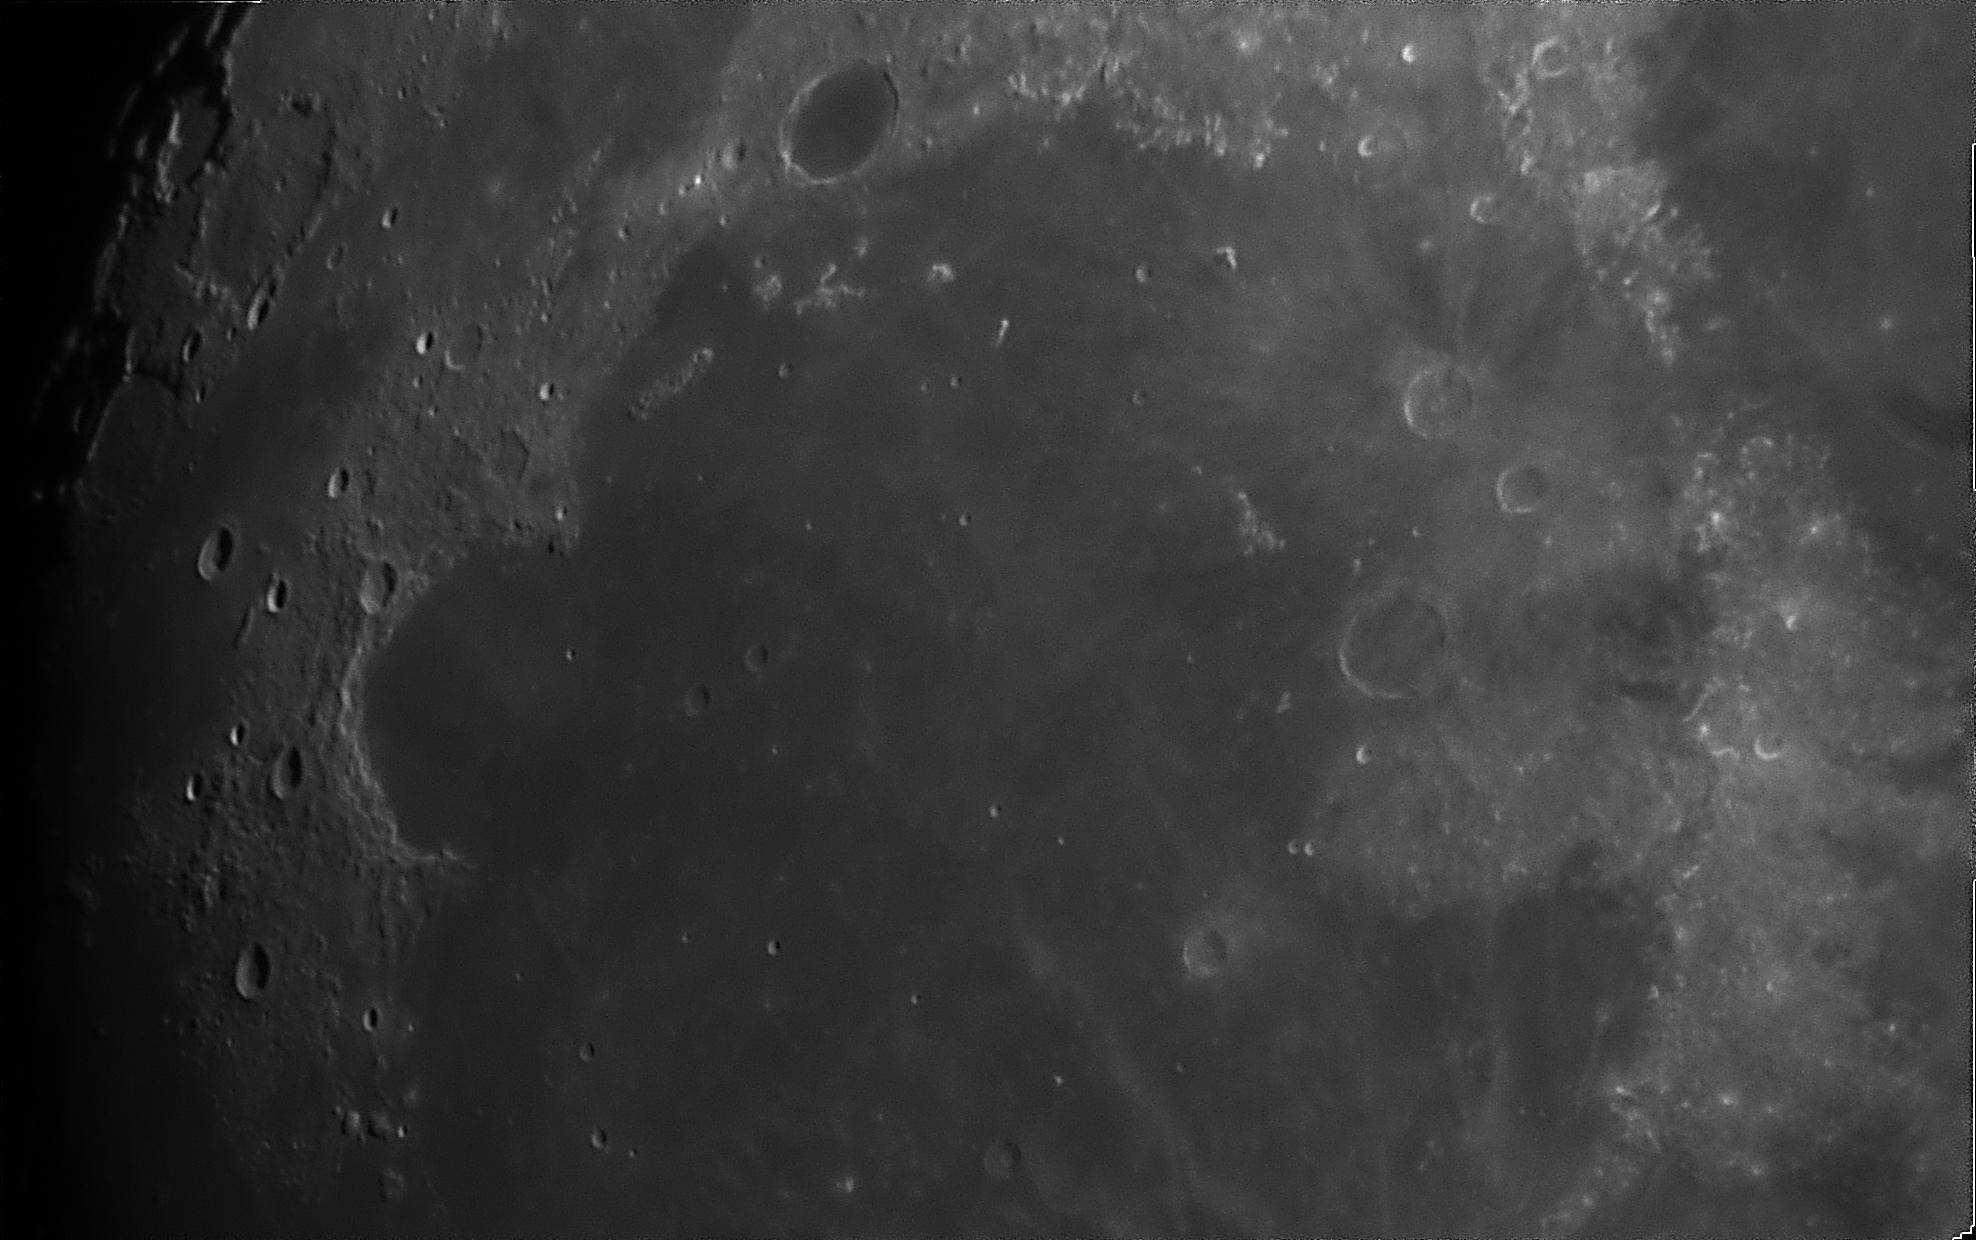 2019-10-10_T_20-44-58-0752-Pluies-Platon.jpg.7d1129288b9e2324e1efa0aa67d4c26d.jpg